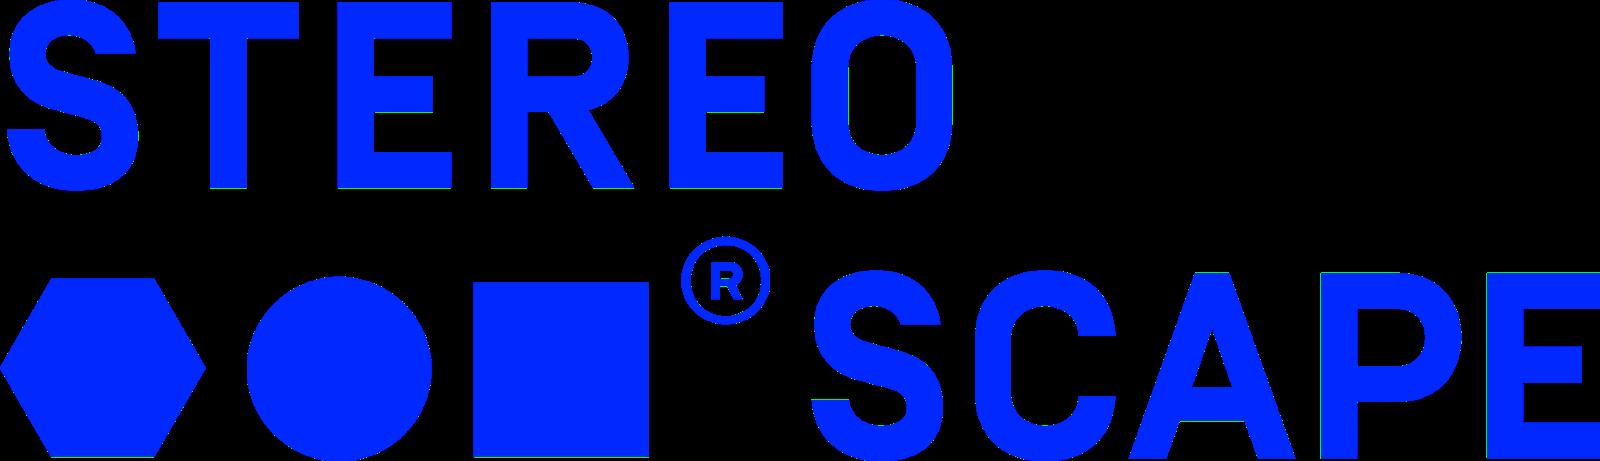 StereoScape logo